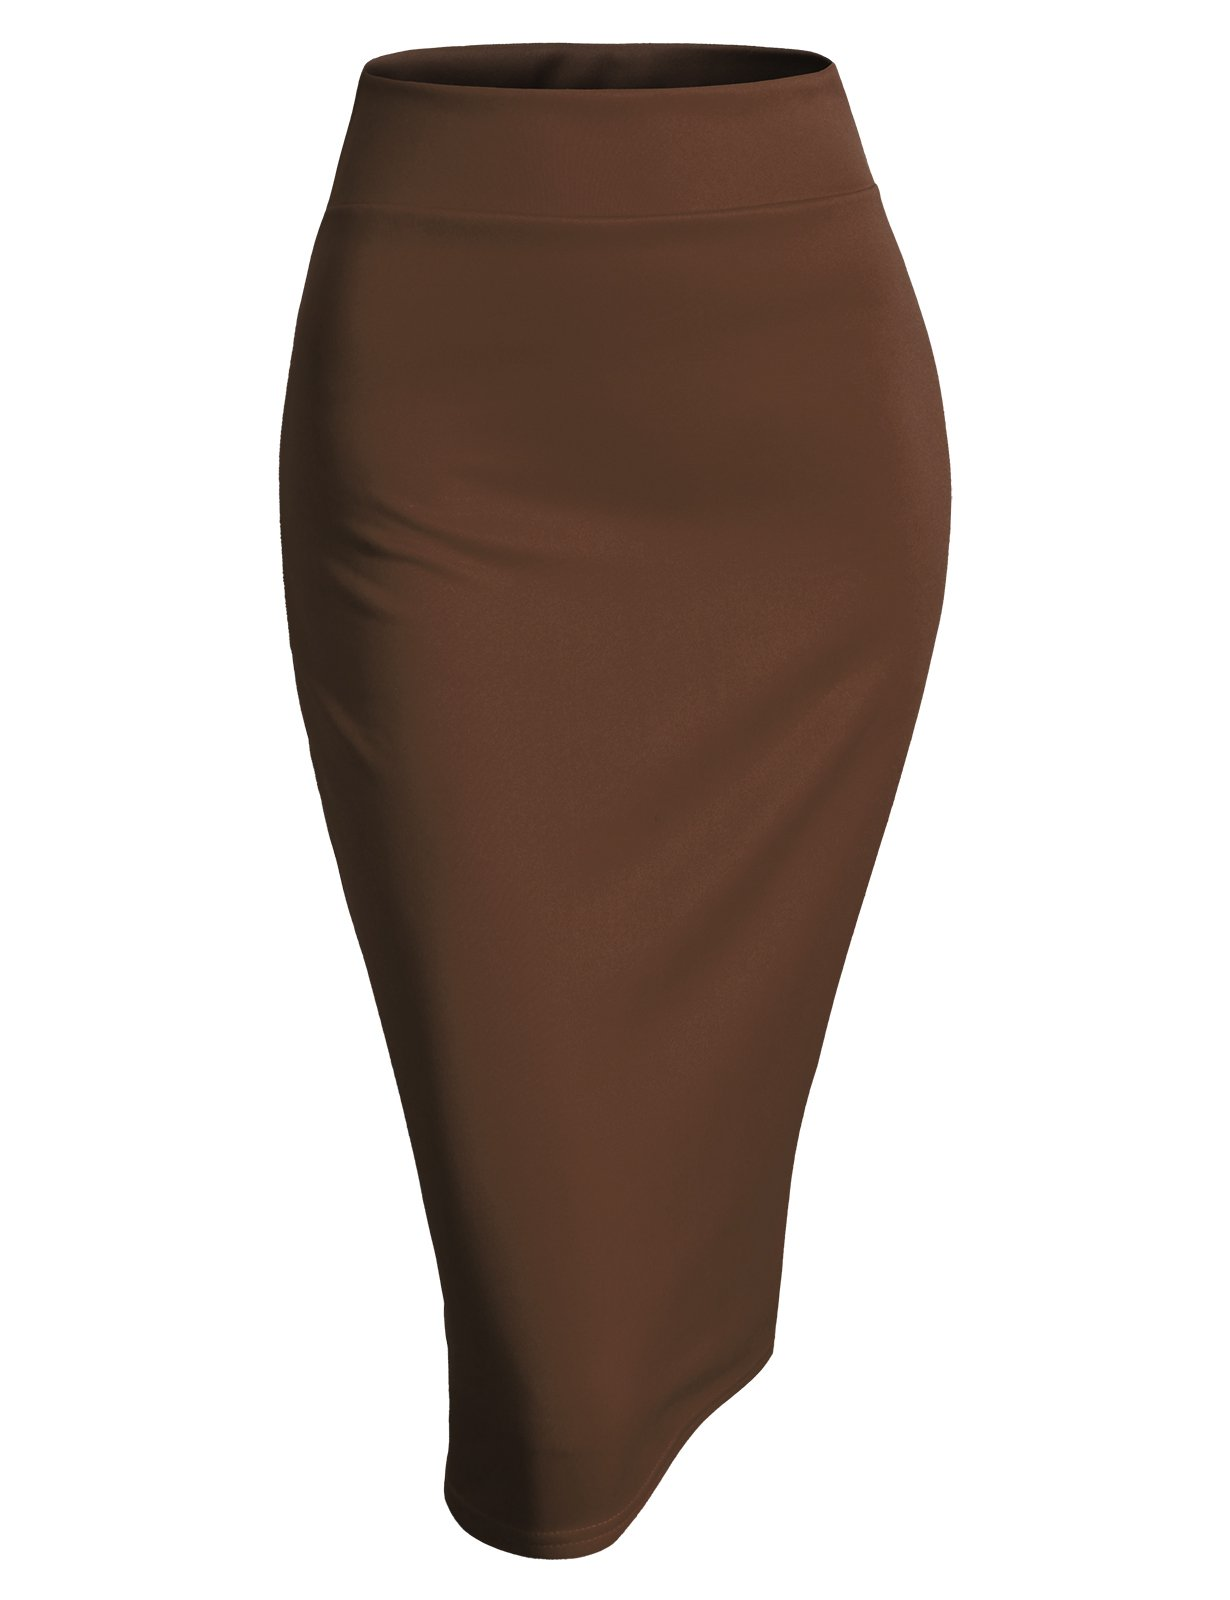 H2H Womens Basic Versatile Elastic Waist Band Office Pencil Skirt Chocolate 2XL (AWBMS0189)